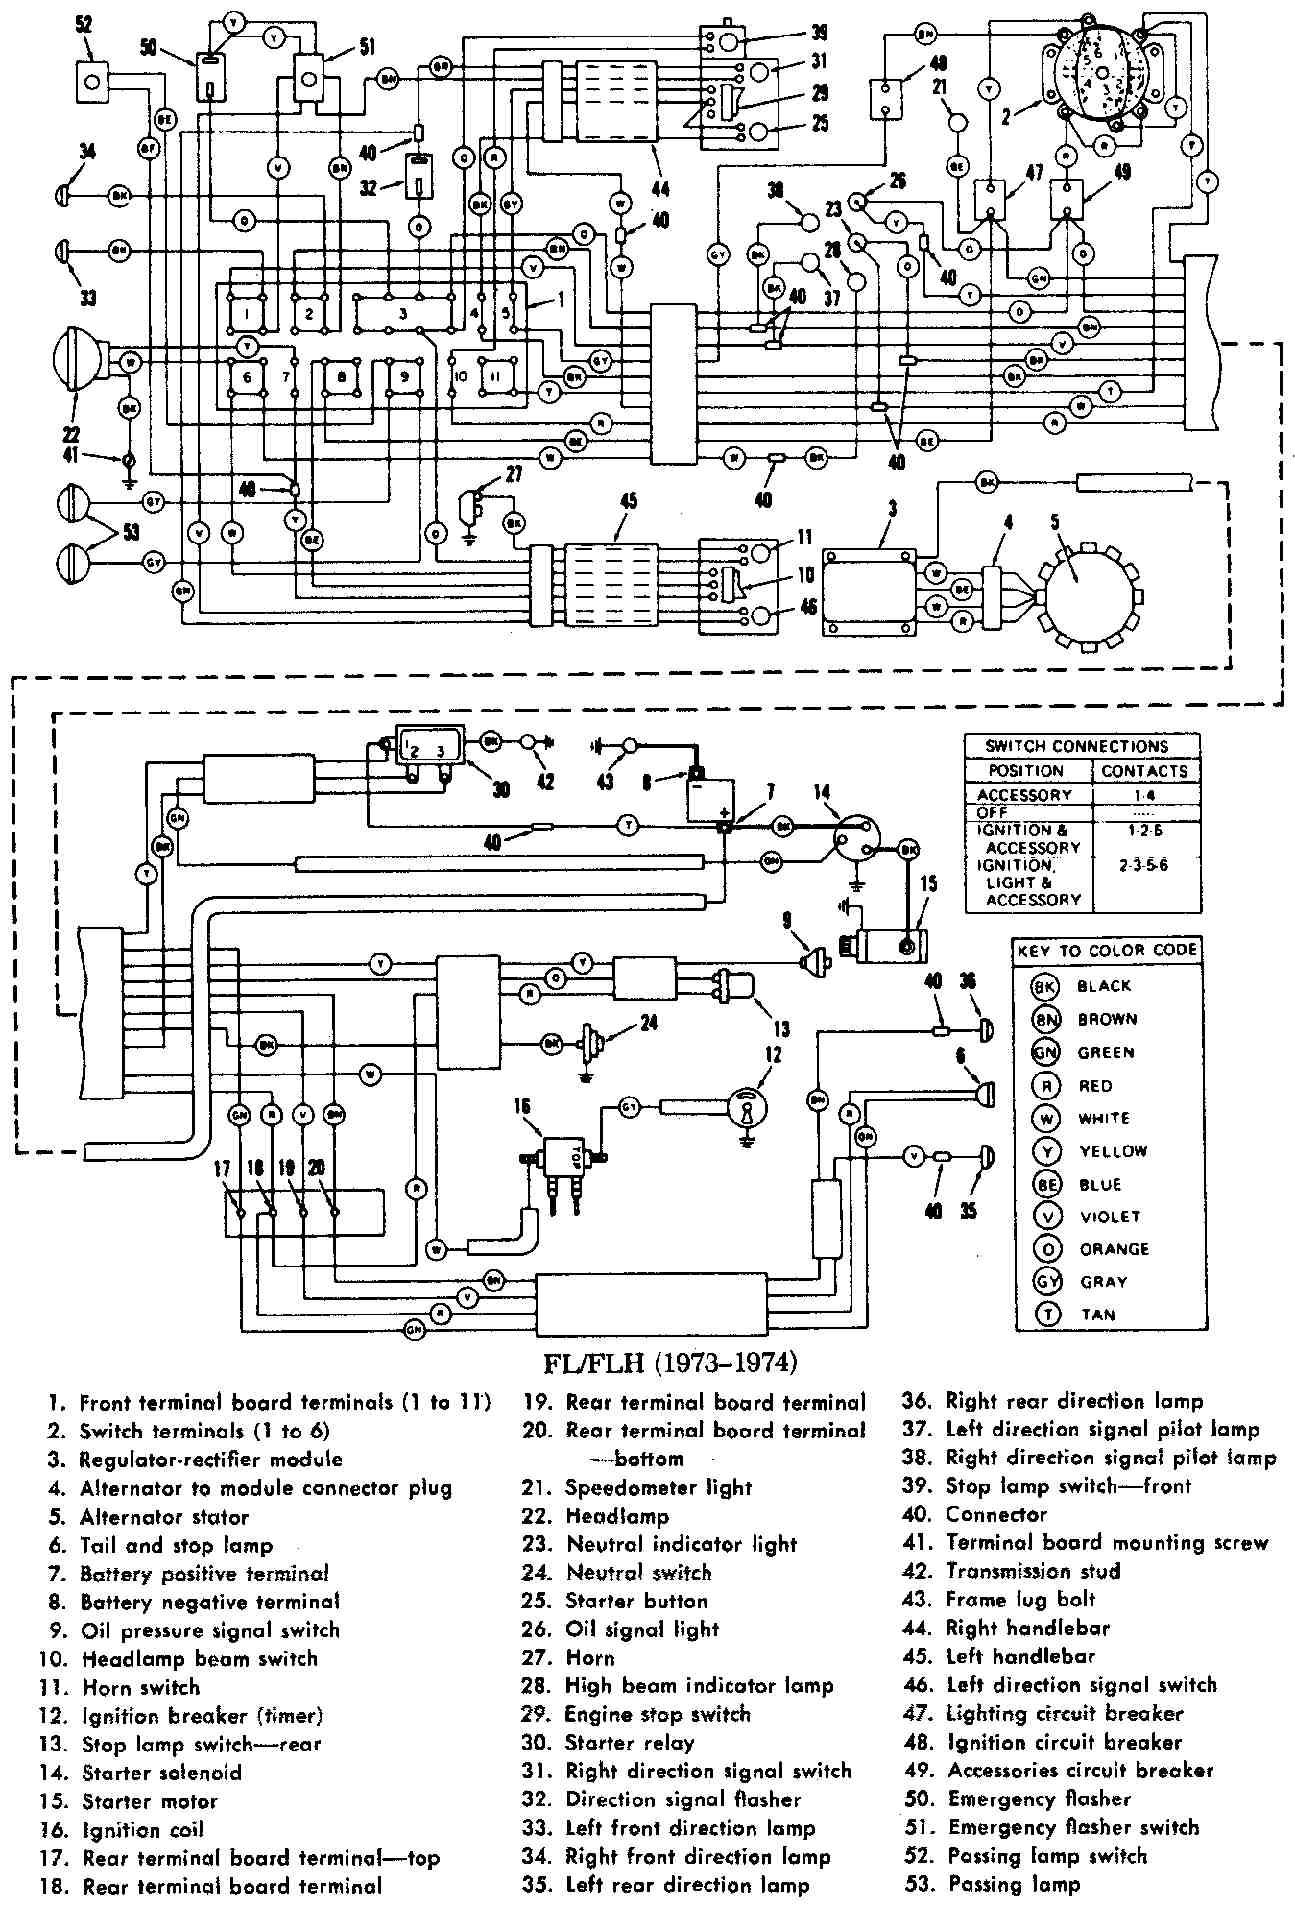 small resolution of 1972 harley davidson wiring diagram wiring diagram third level 1974 harley davidson golf cart wiring diagram